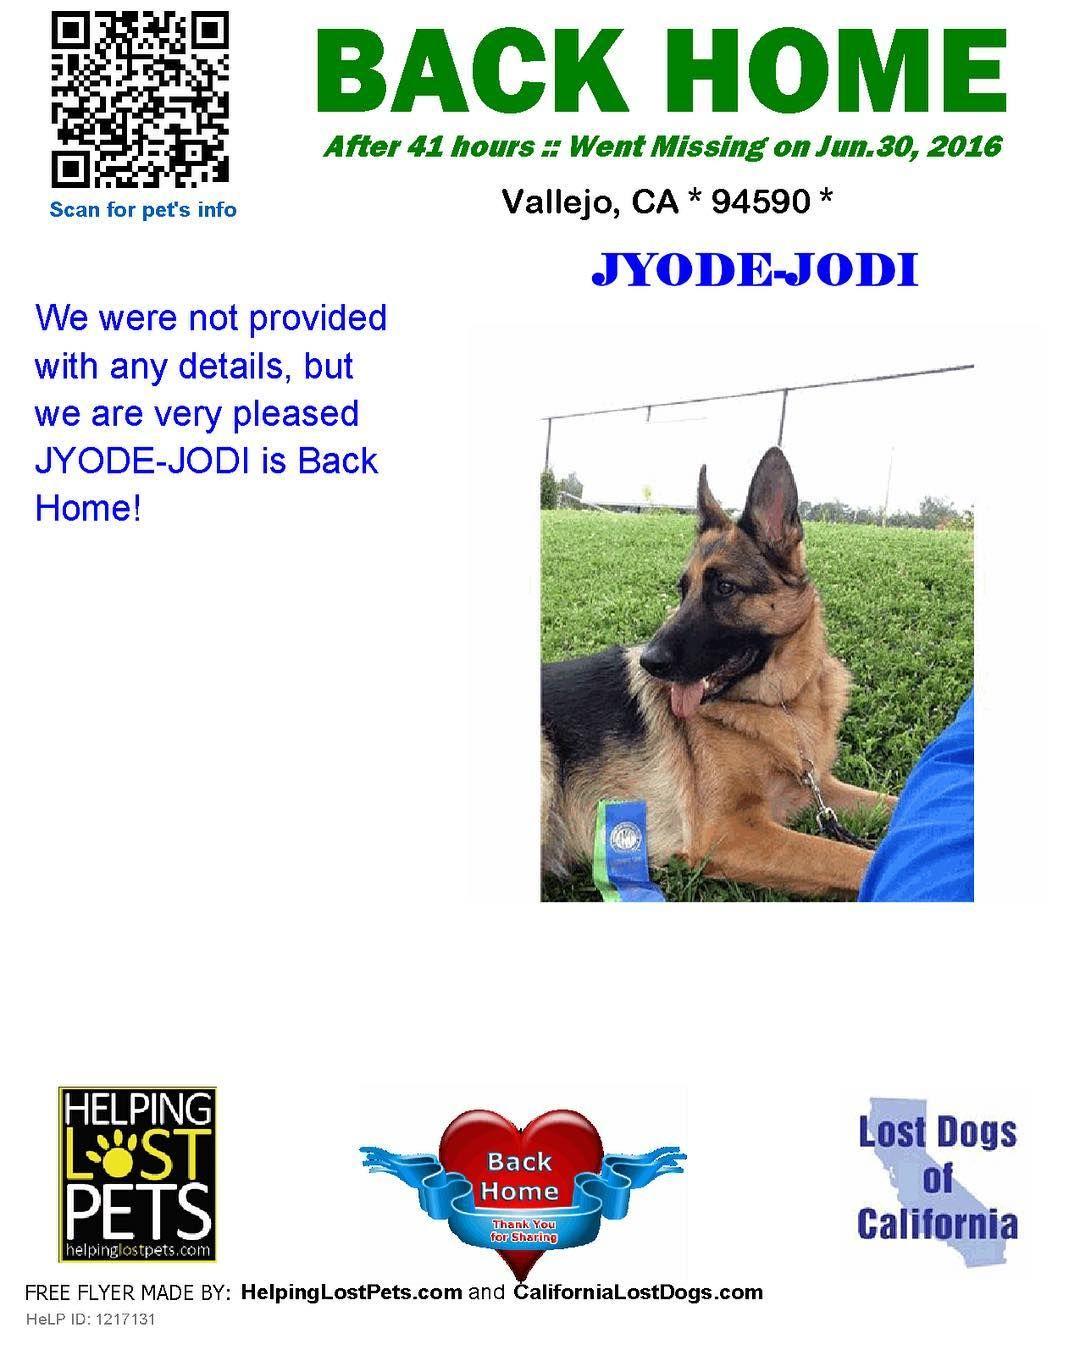 Backhome Jyode Jodi Germanshepherddog From Vallejo Ca Has Been Reunited With Her Family Lost 6 30 16 Back Home 7 1 1 Losing A Dog Losing A Pet Vallejo